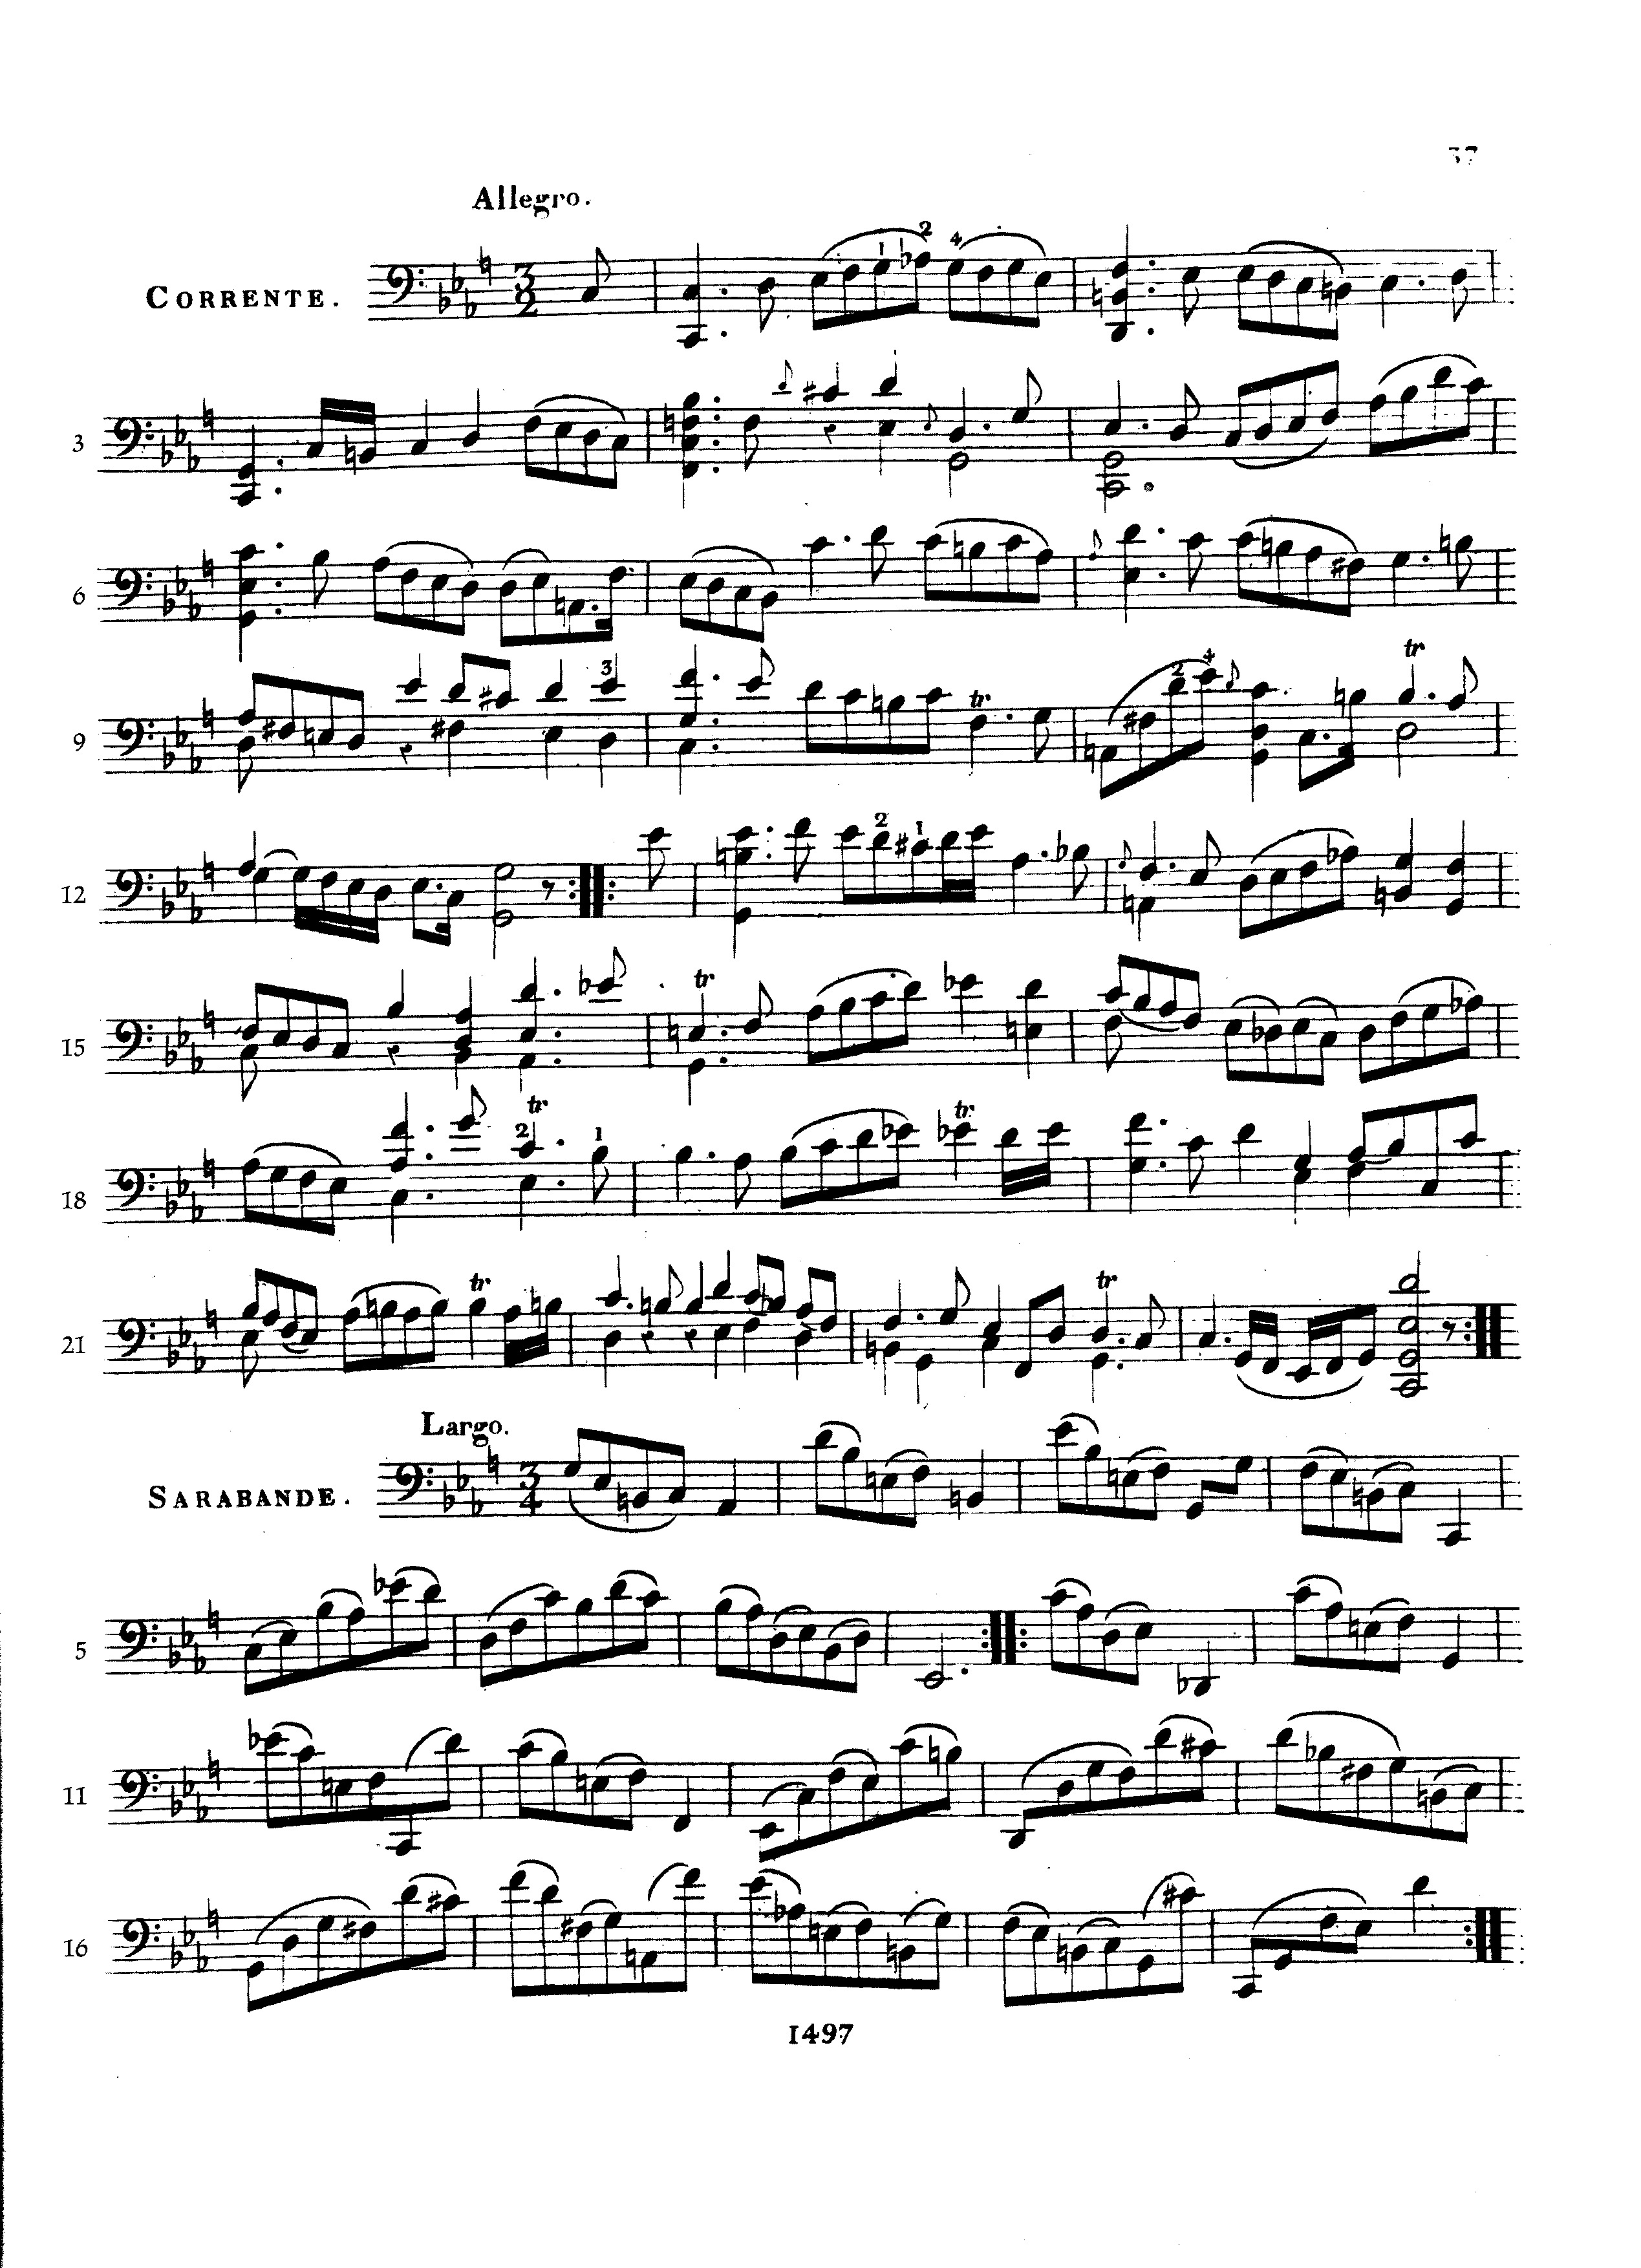 Pablo Casals Js Bach Cello Suite No 5 In C Minor Bwv 1011